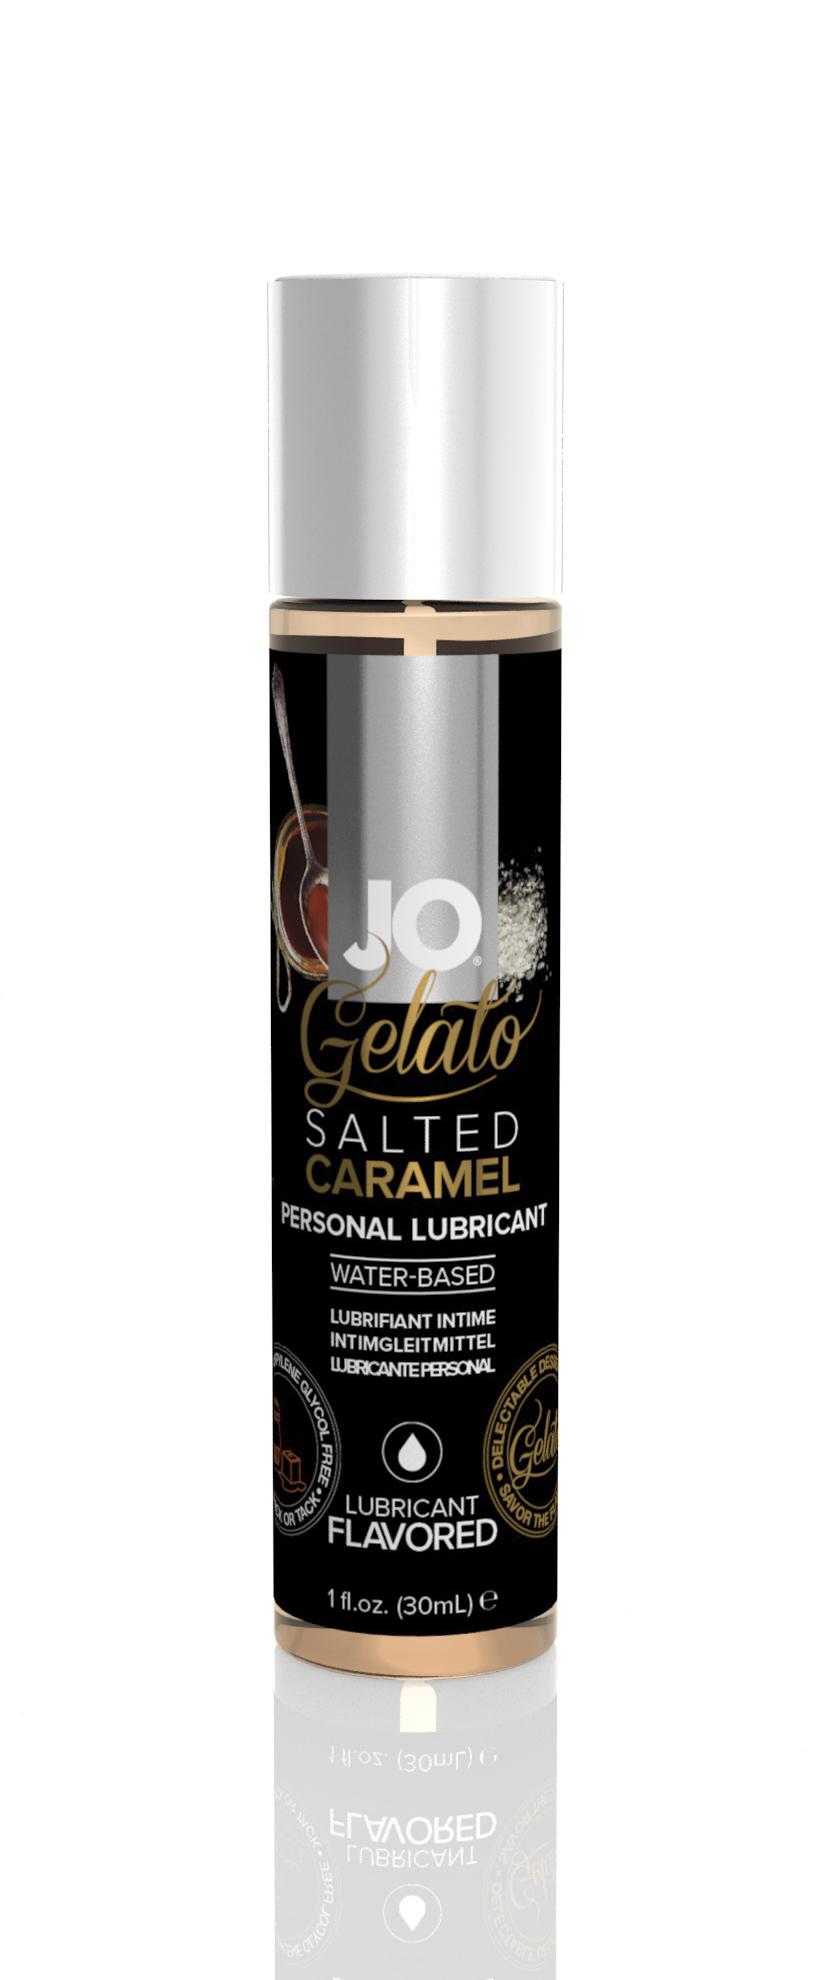 41023 - JO GELATO - SALTED CARAMEL - LUBRICANT (WATER-BASED) 1 floz 30 mL.jpg